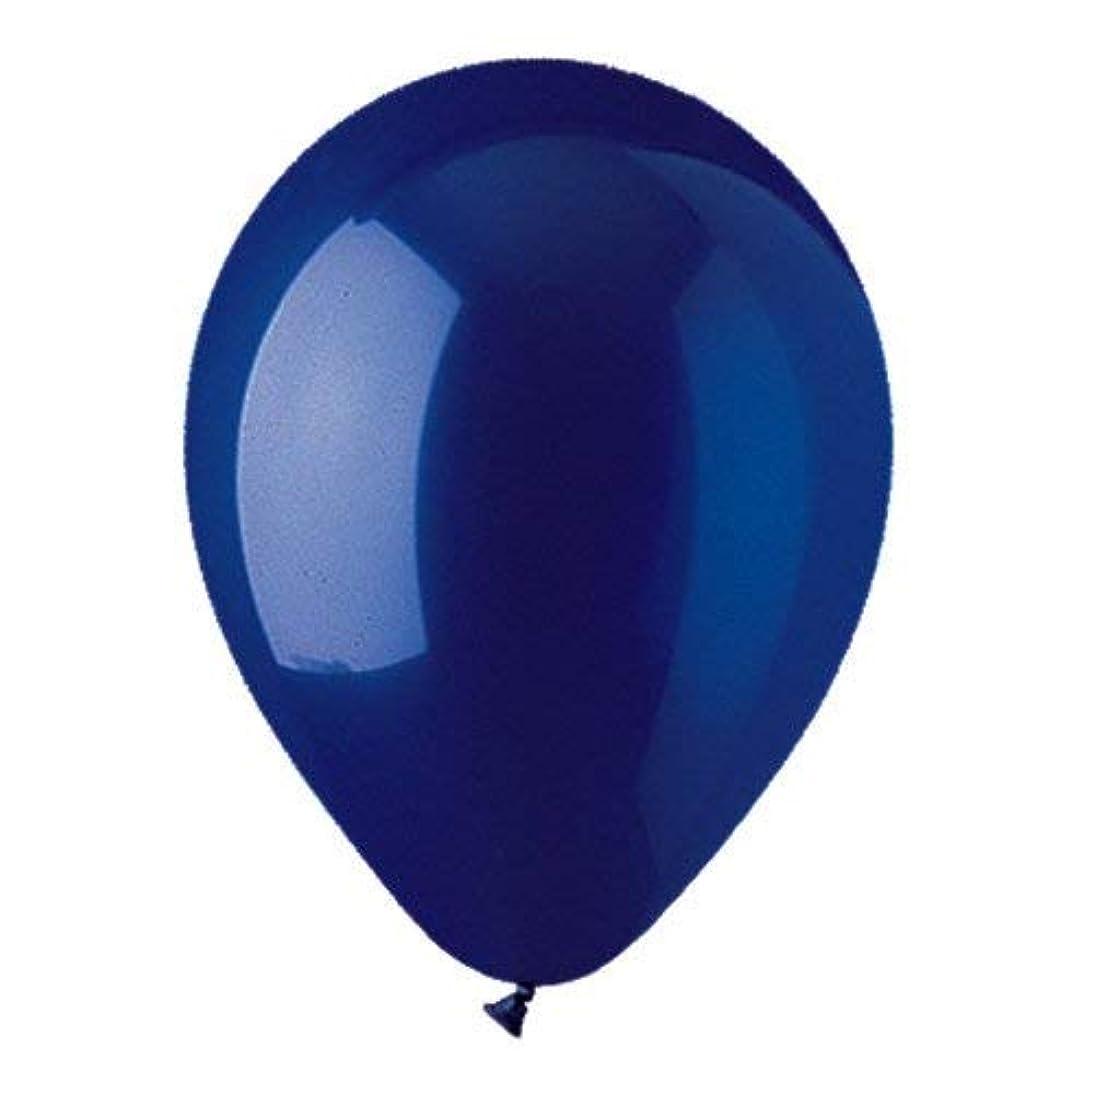 CTI Latex Balloons 912137 CRYSTAL NAVY BLUE, 12